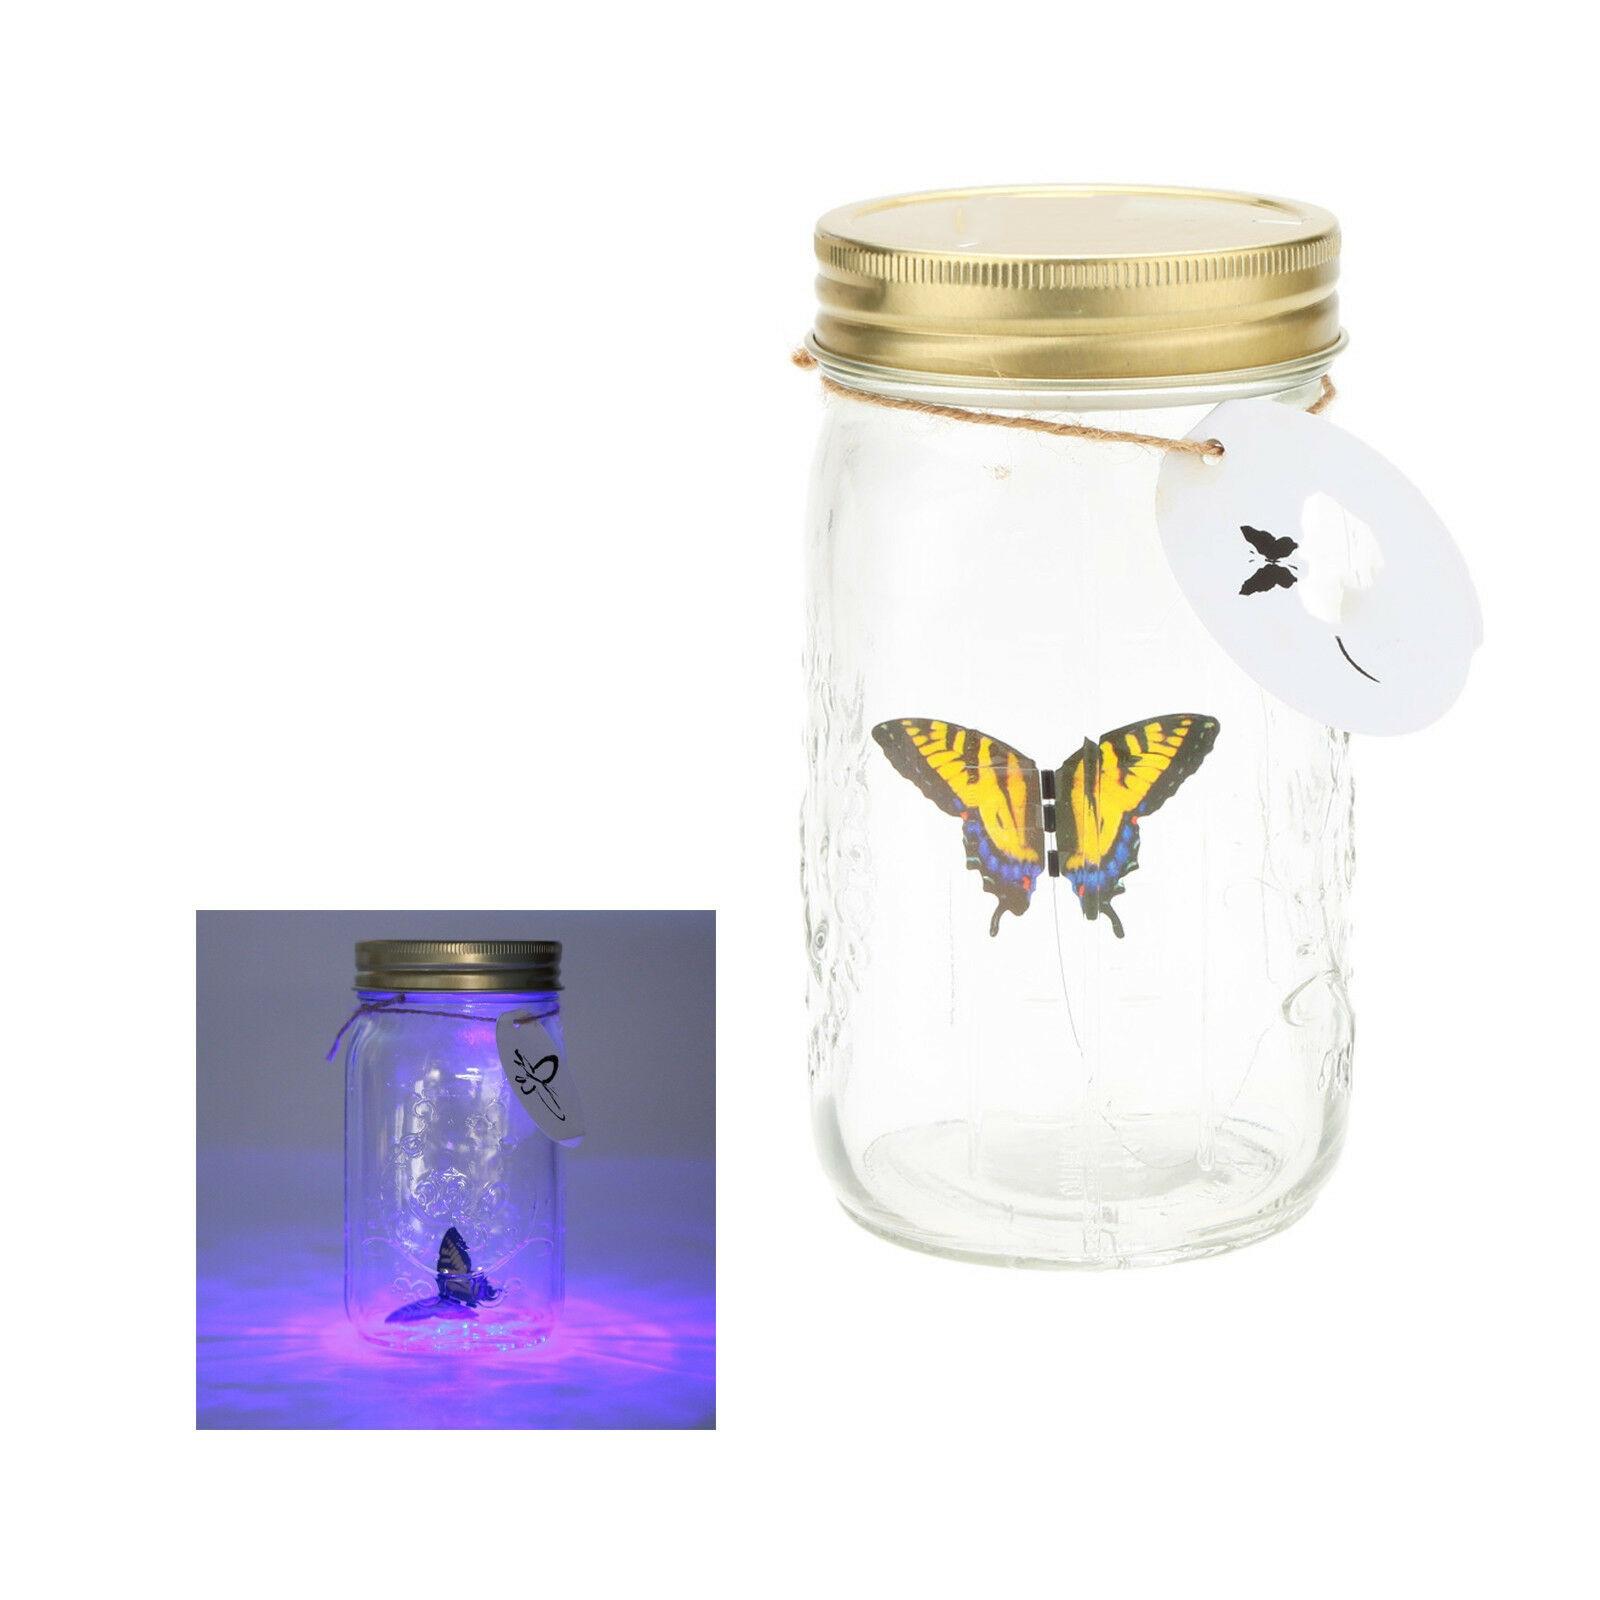 Kelebihan Kupu-kupu Lampu Kaca